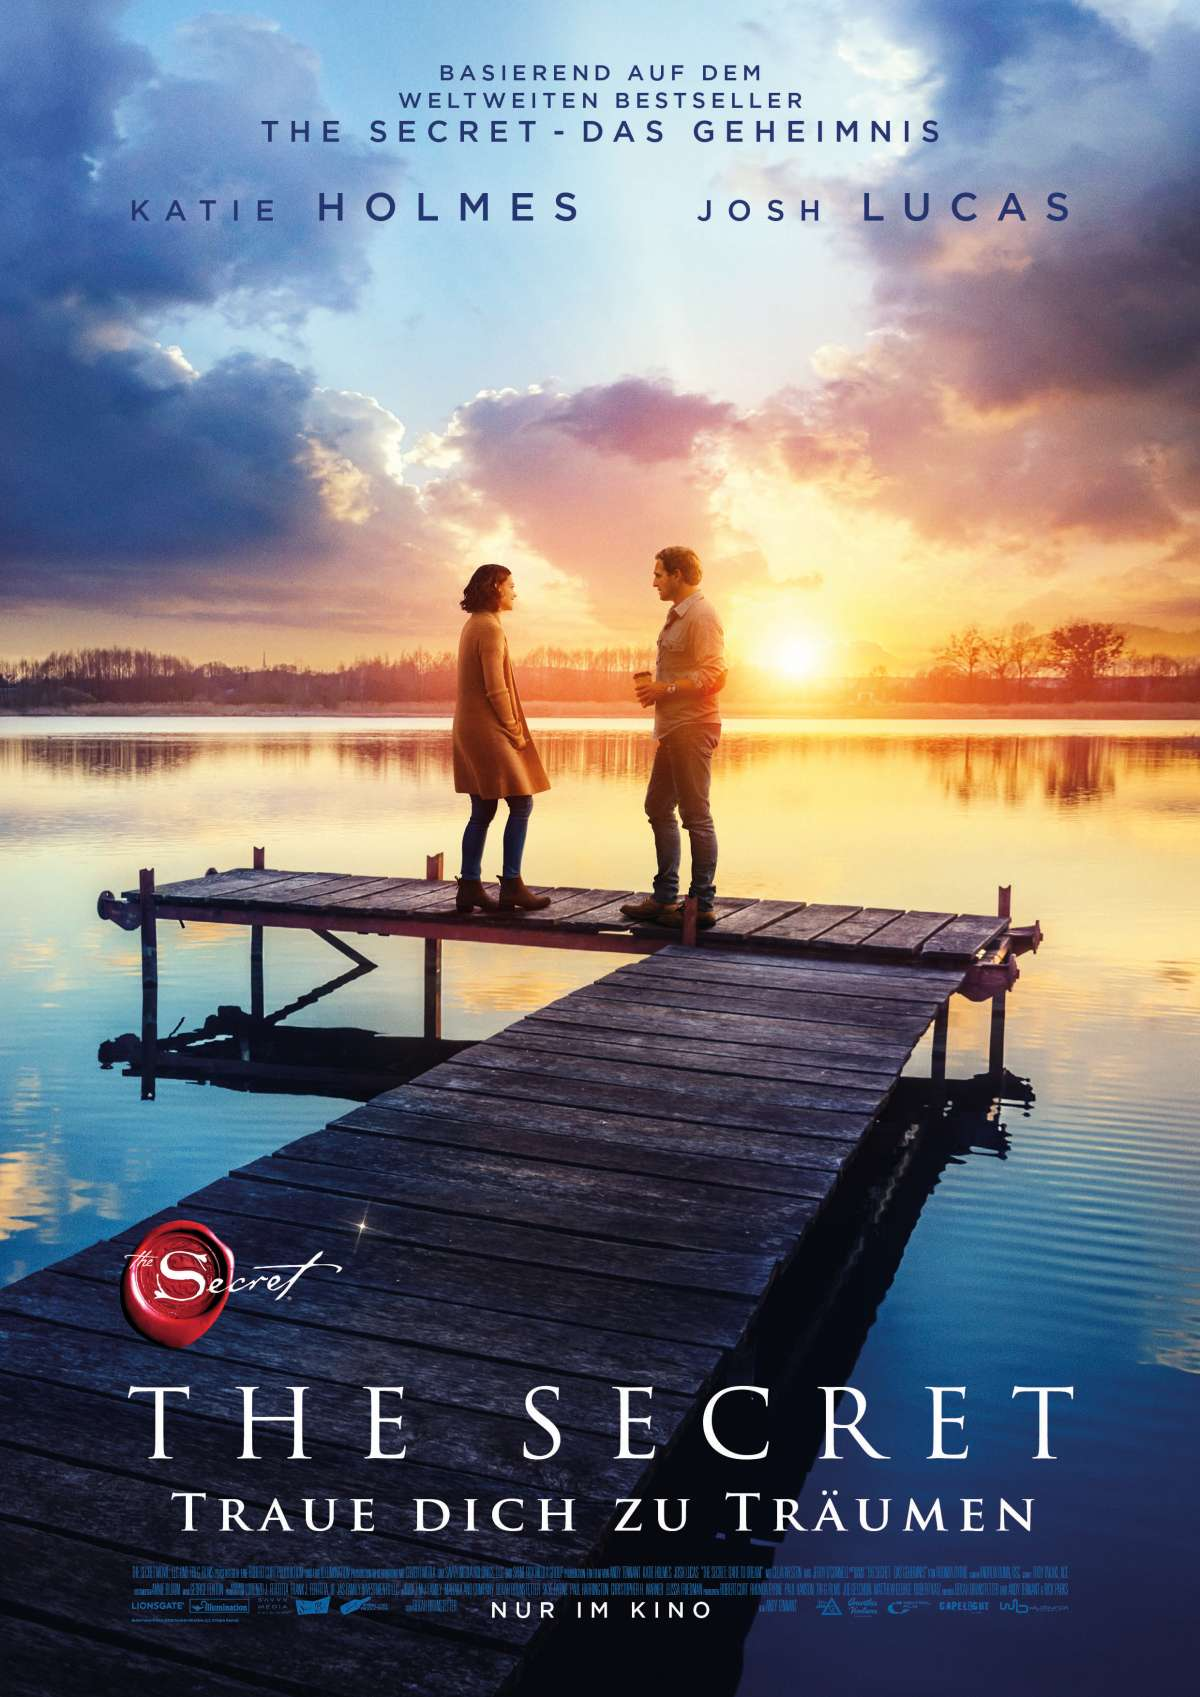 The Secret - Traue dich zu träumen - CineK-Kino  - Korbach